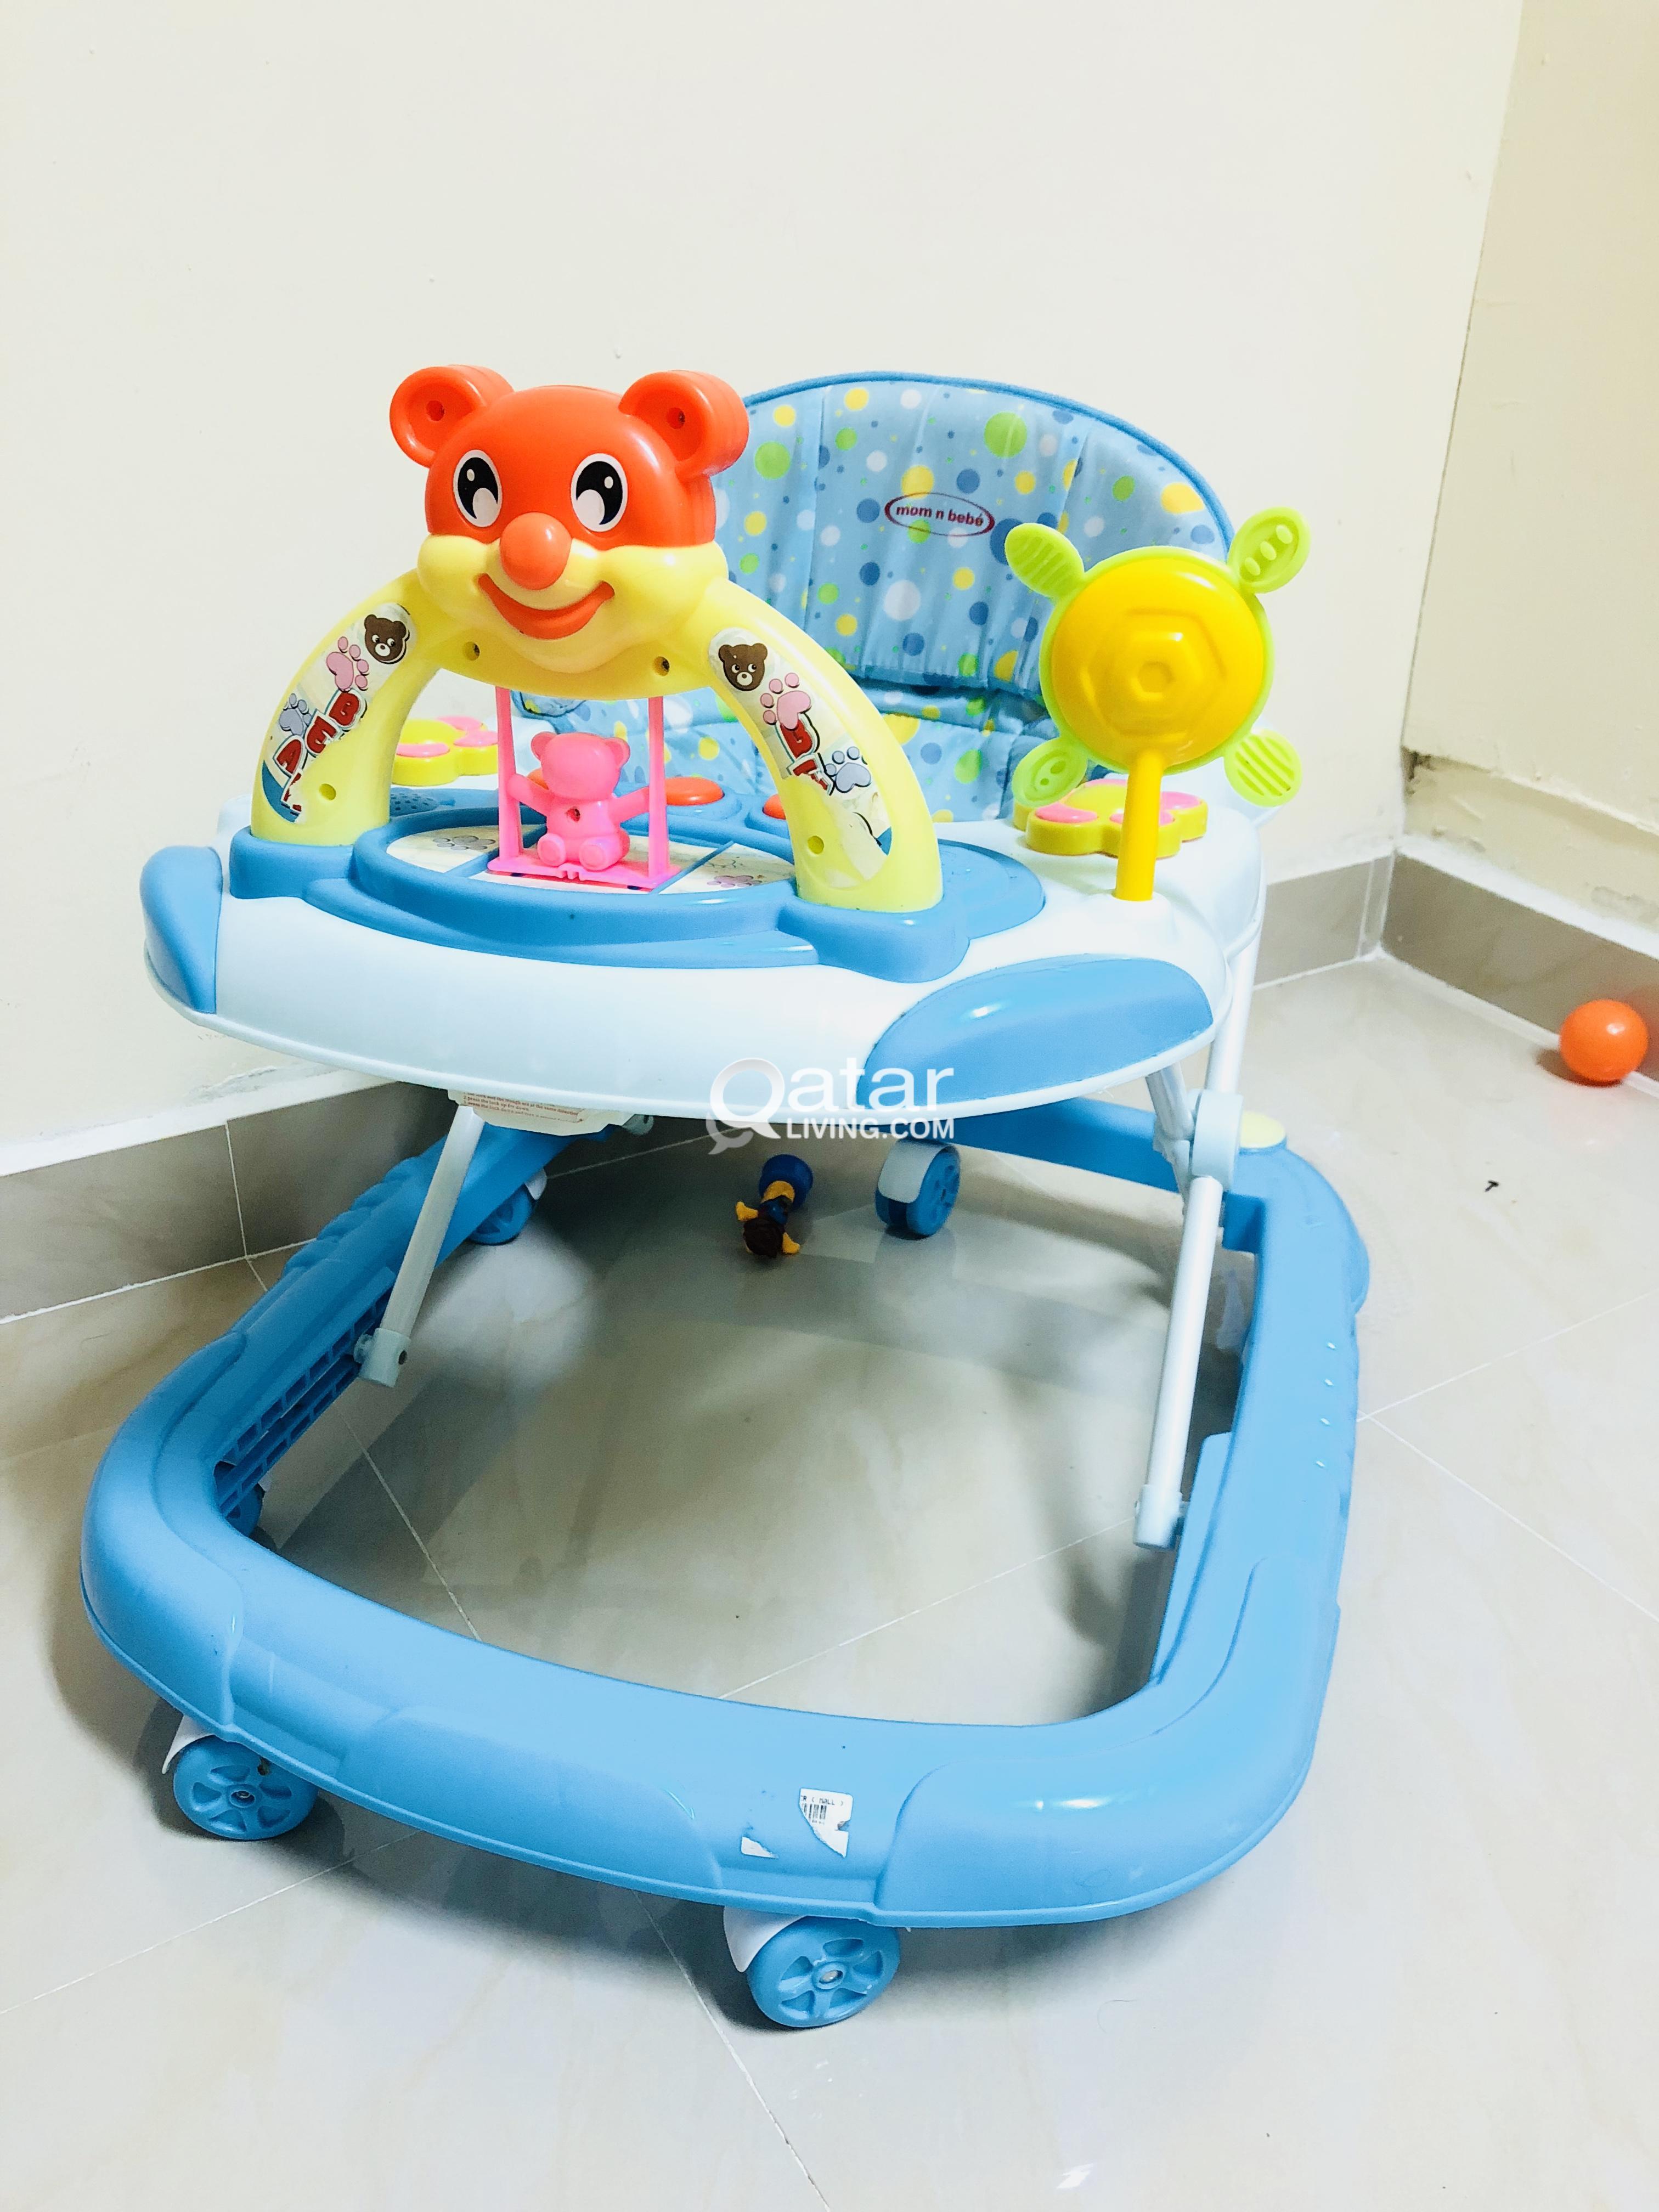 baby walker and bath tub   Qatar Living